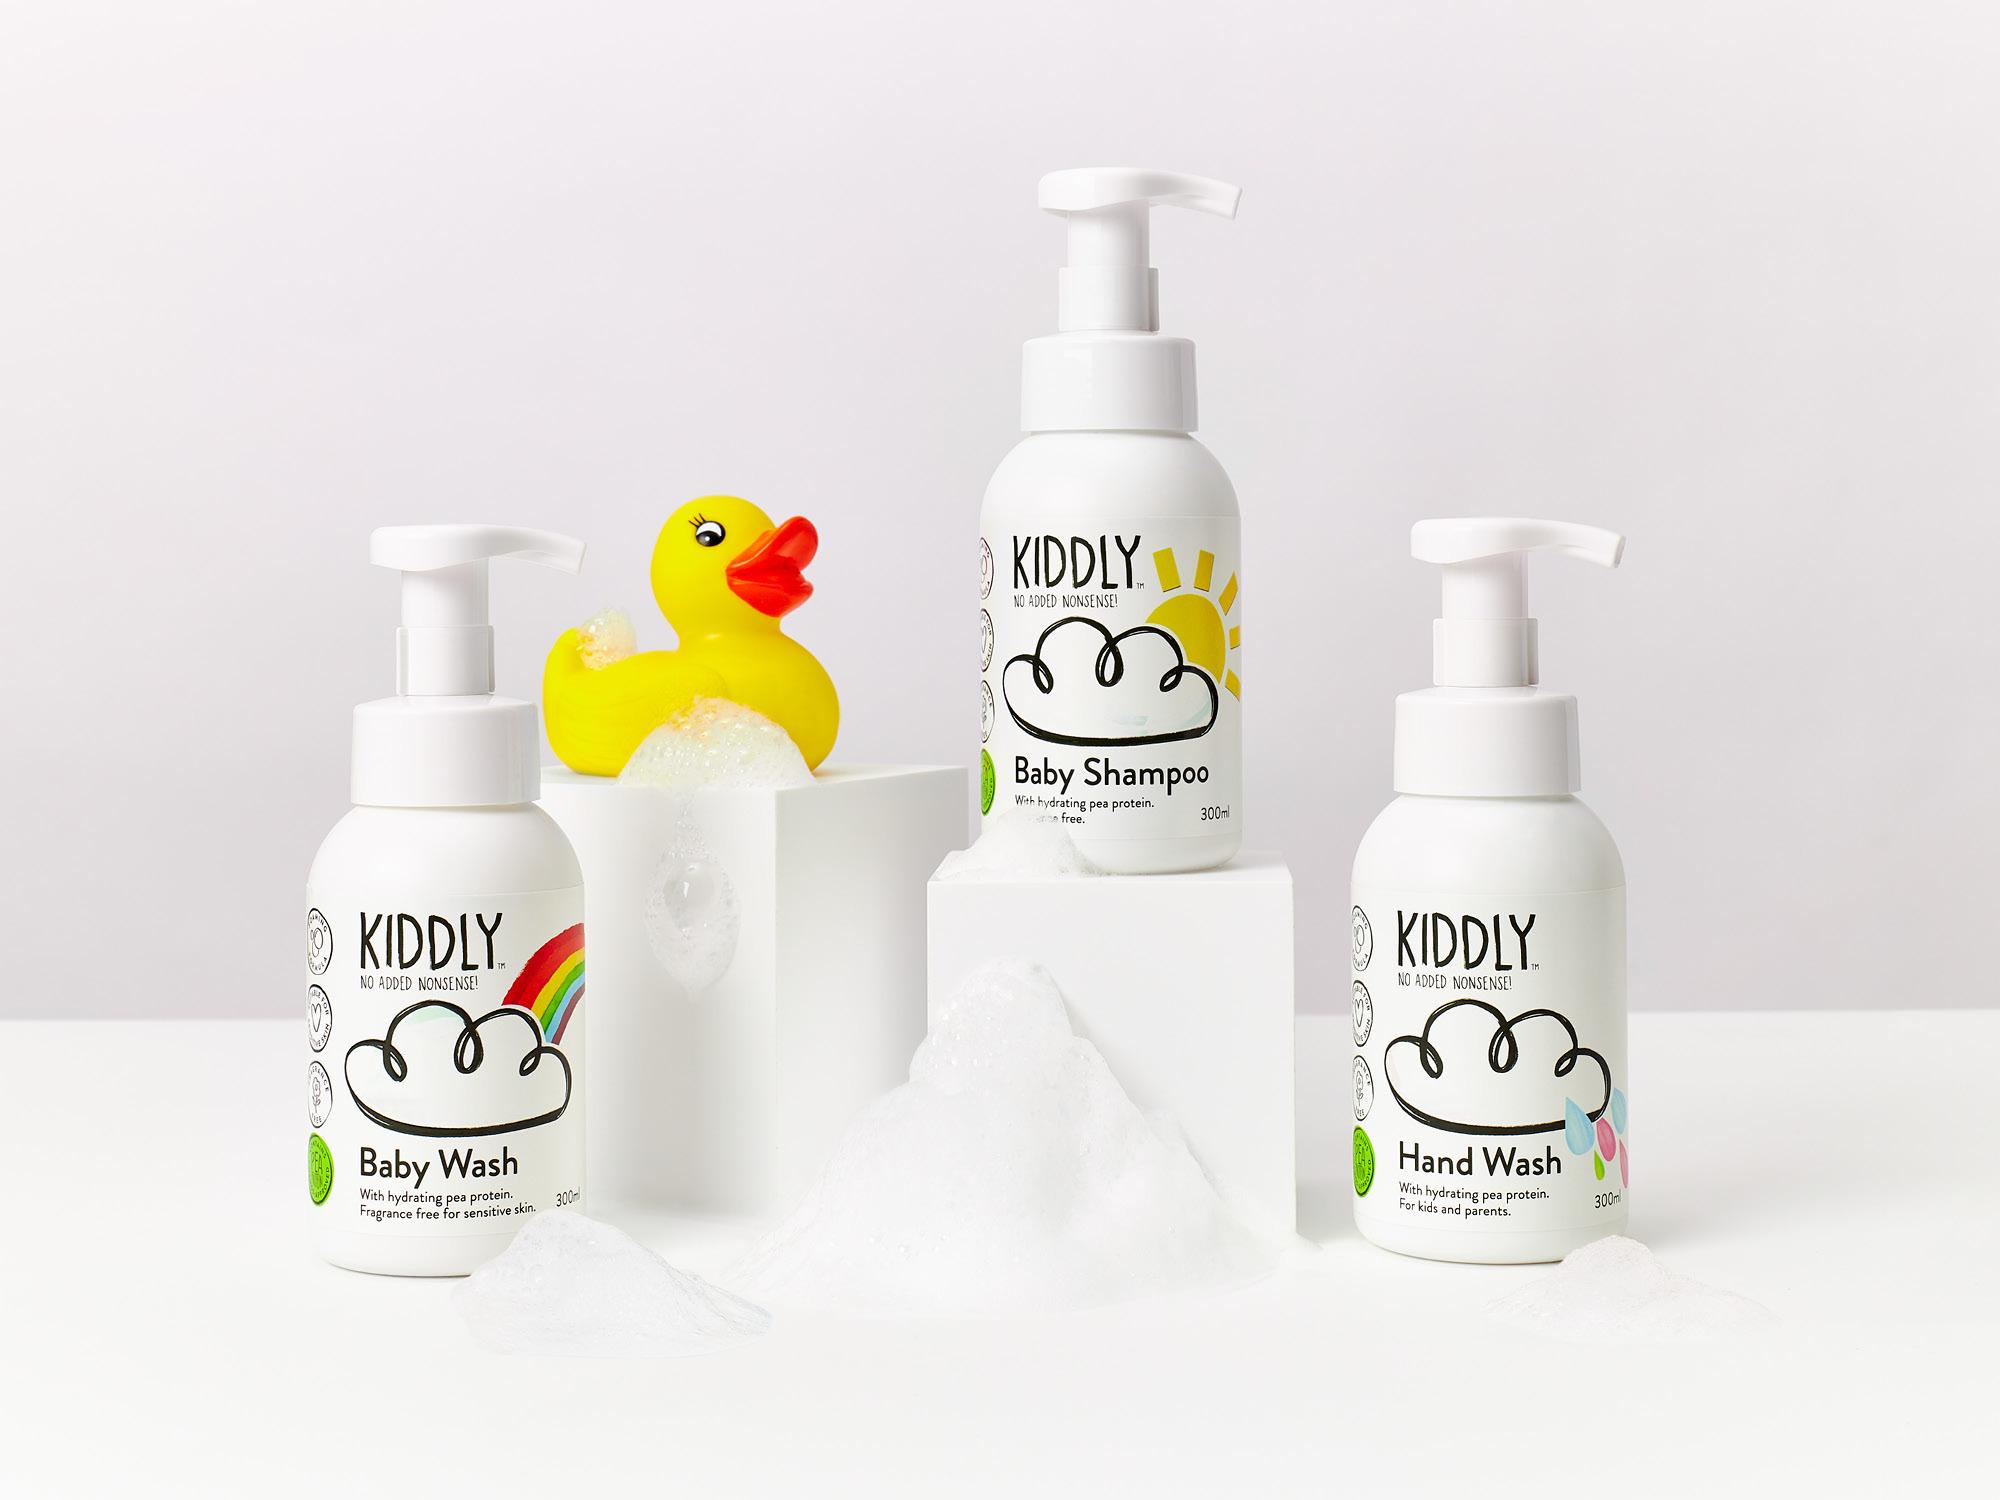 Shampoo & Baby Wash & Hand Soap 3本セット(オーガニック原料、ピープロテイン配合)